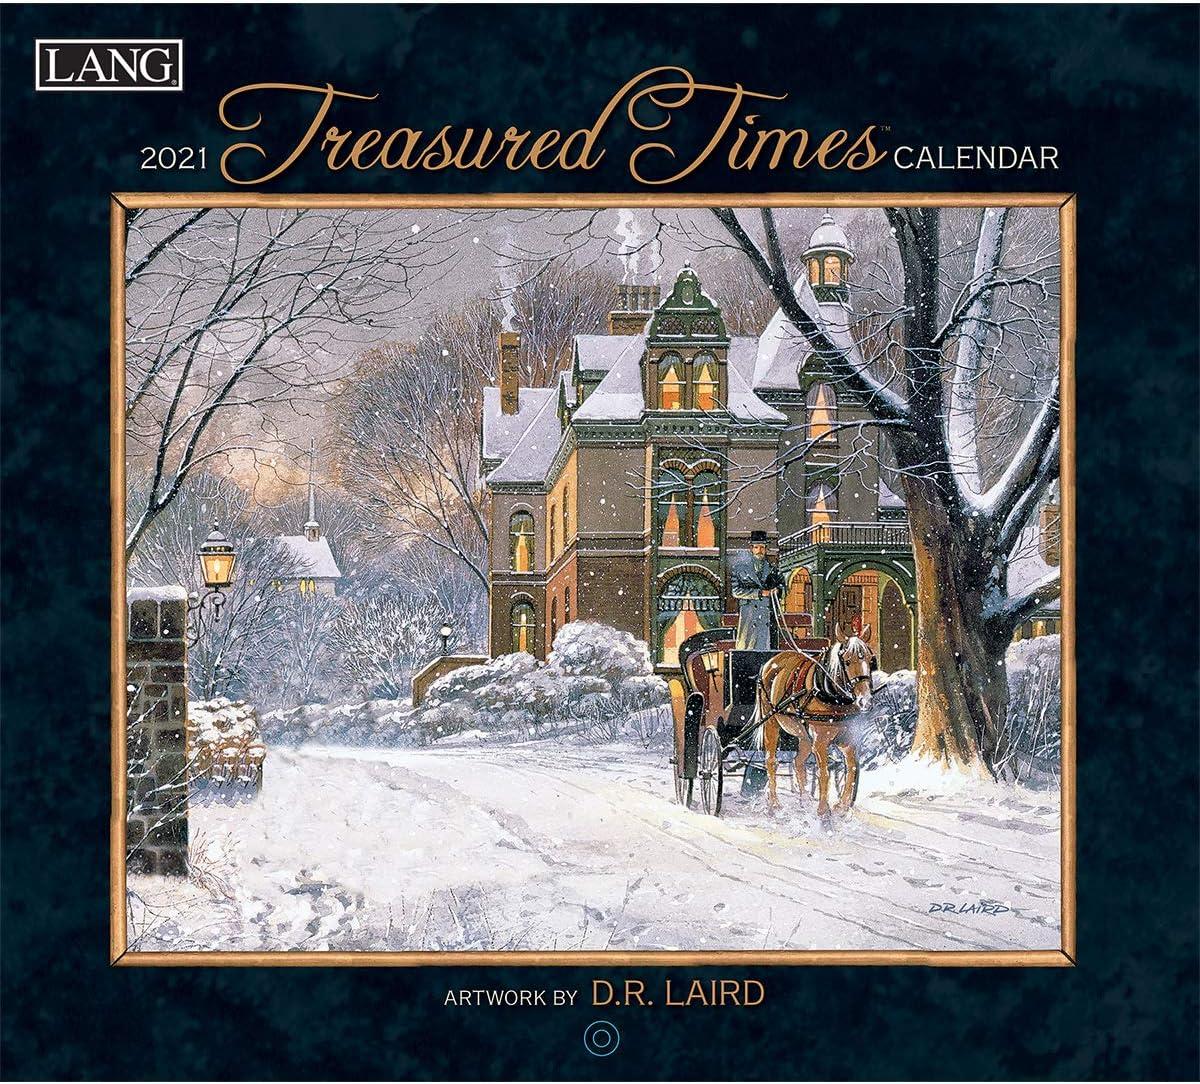 Lang Calendar 2021 Amazon.: LANG Treasured Times 2021 Wall Calendar (21991001882